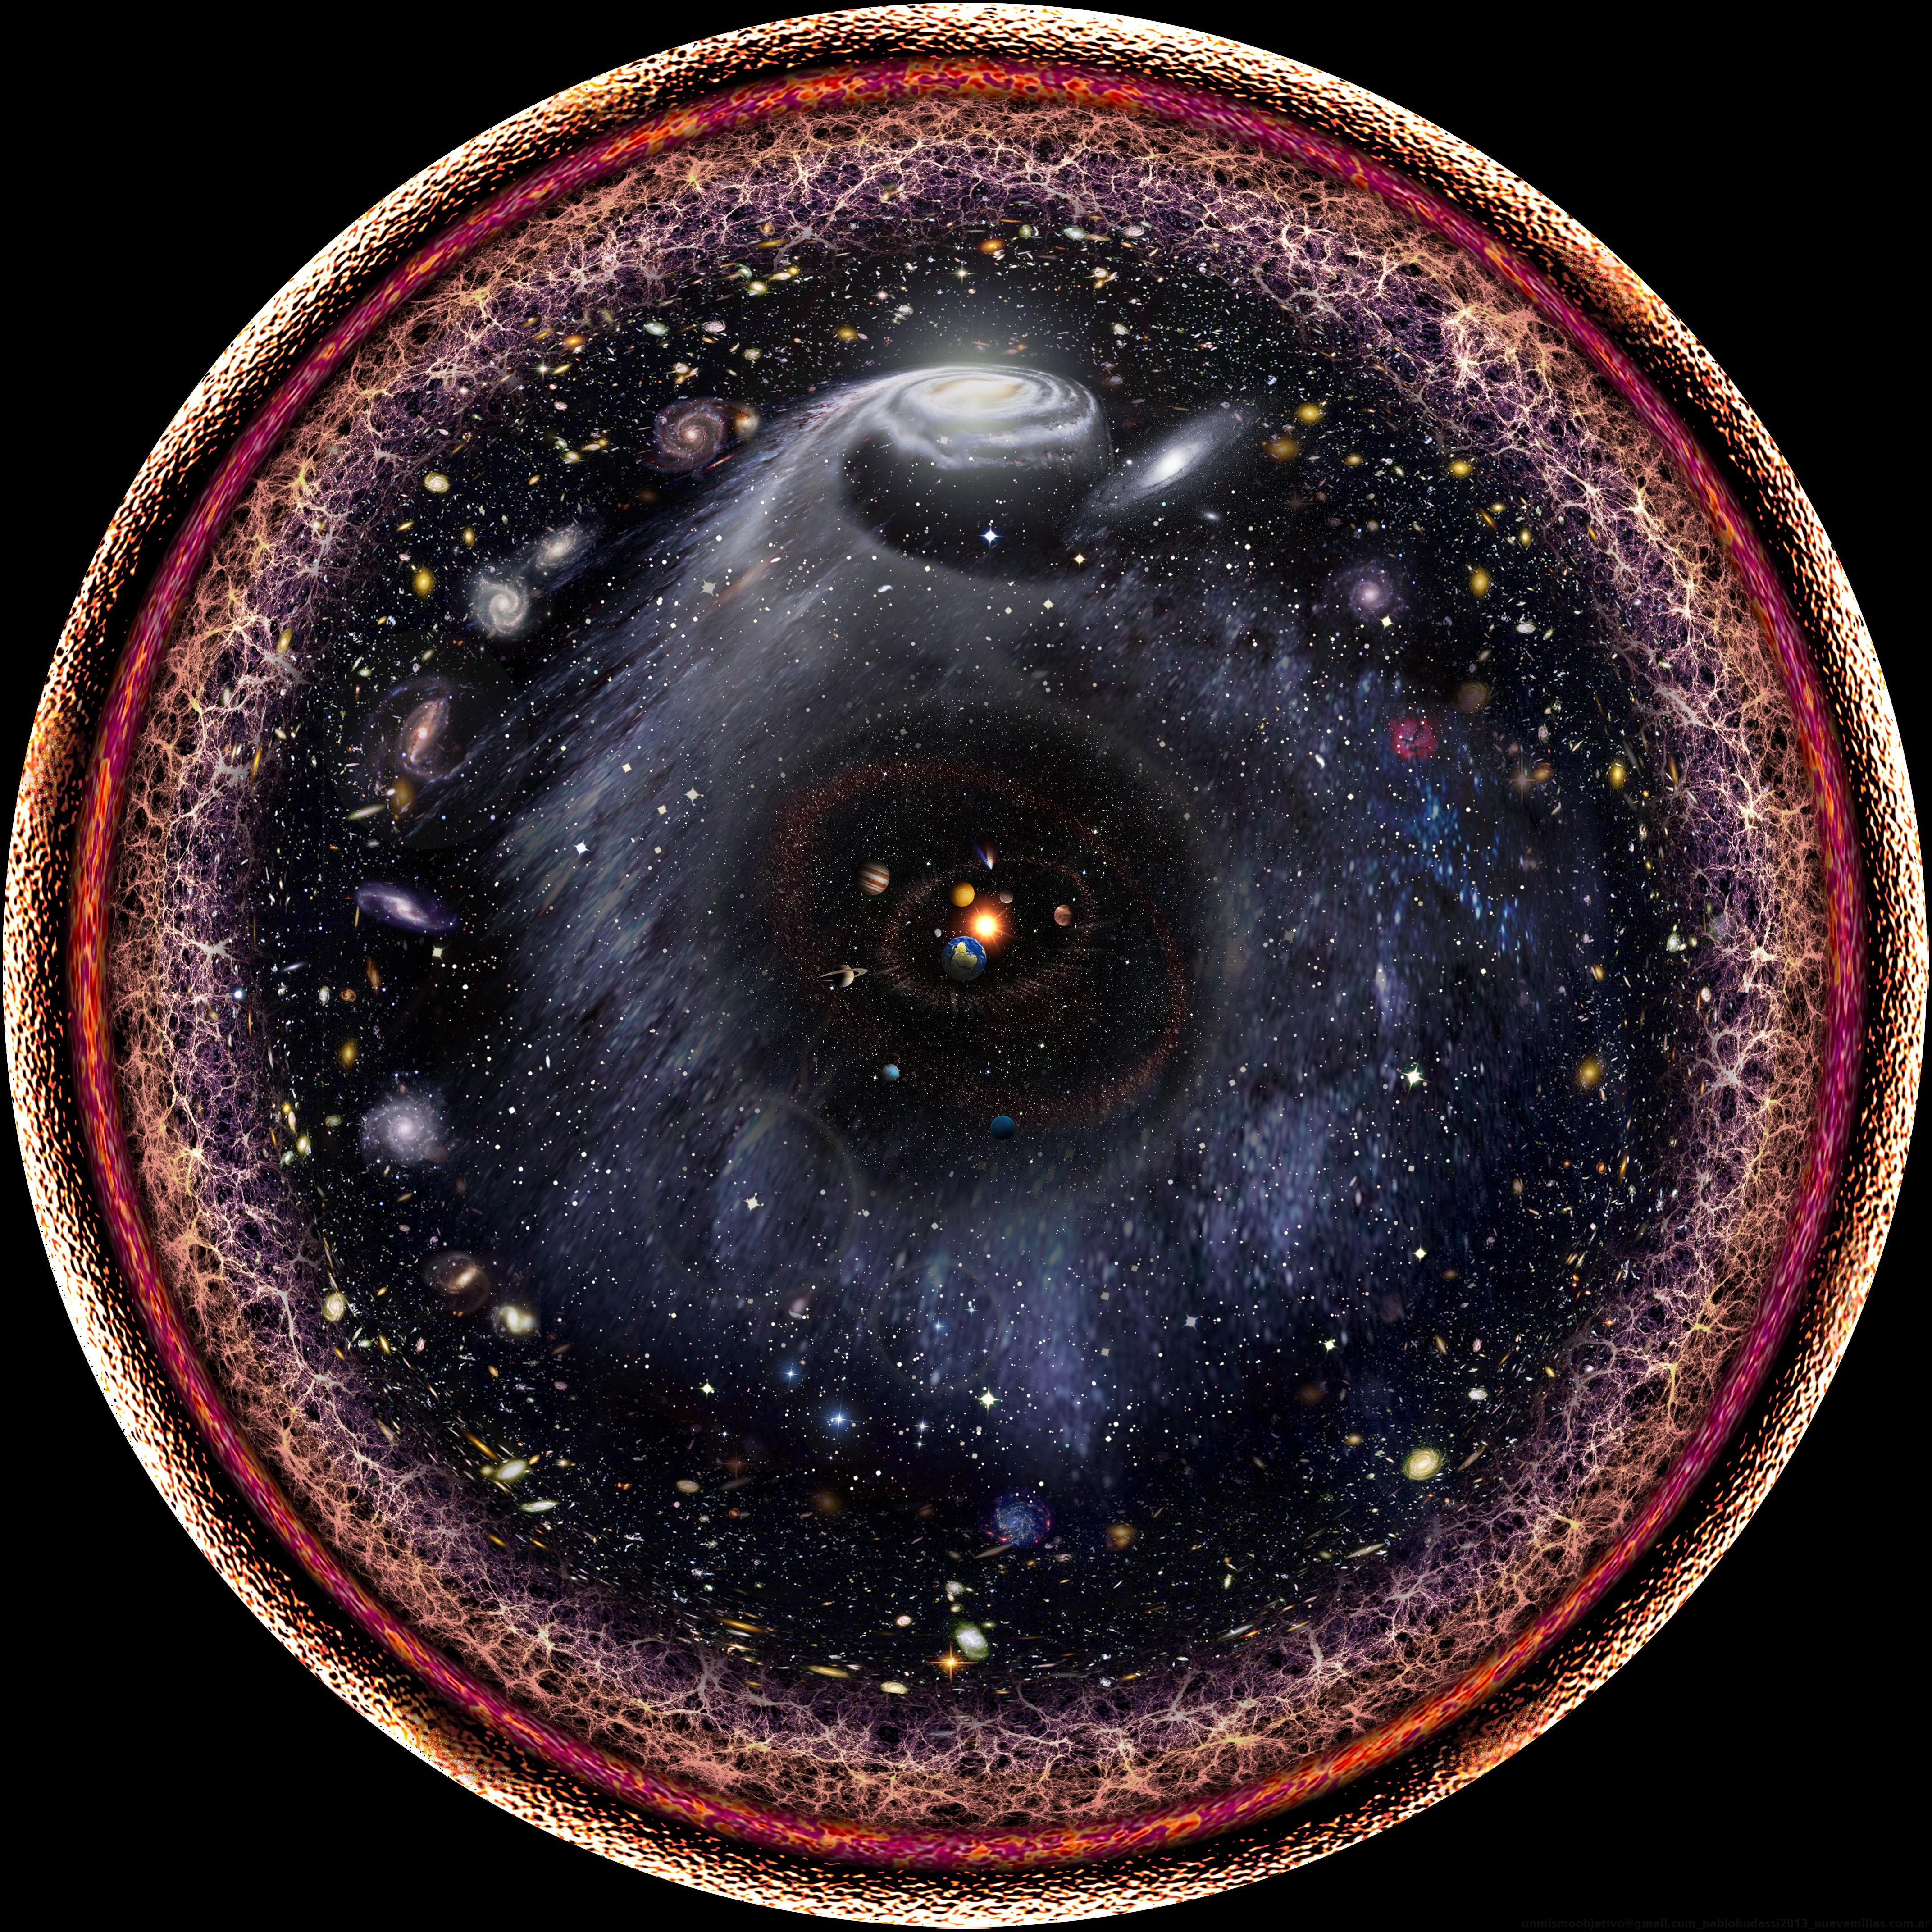 [Logarhitmic_radial_photo_of_the_universe_by_pablo_budassi_9MFK]